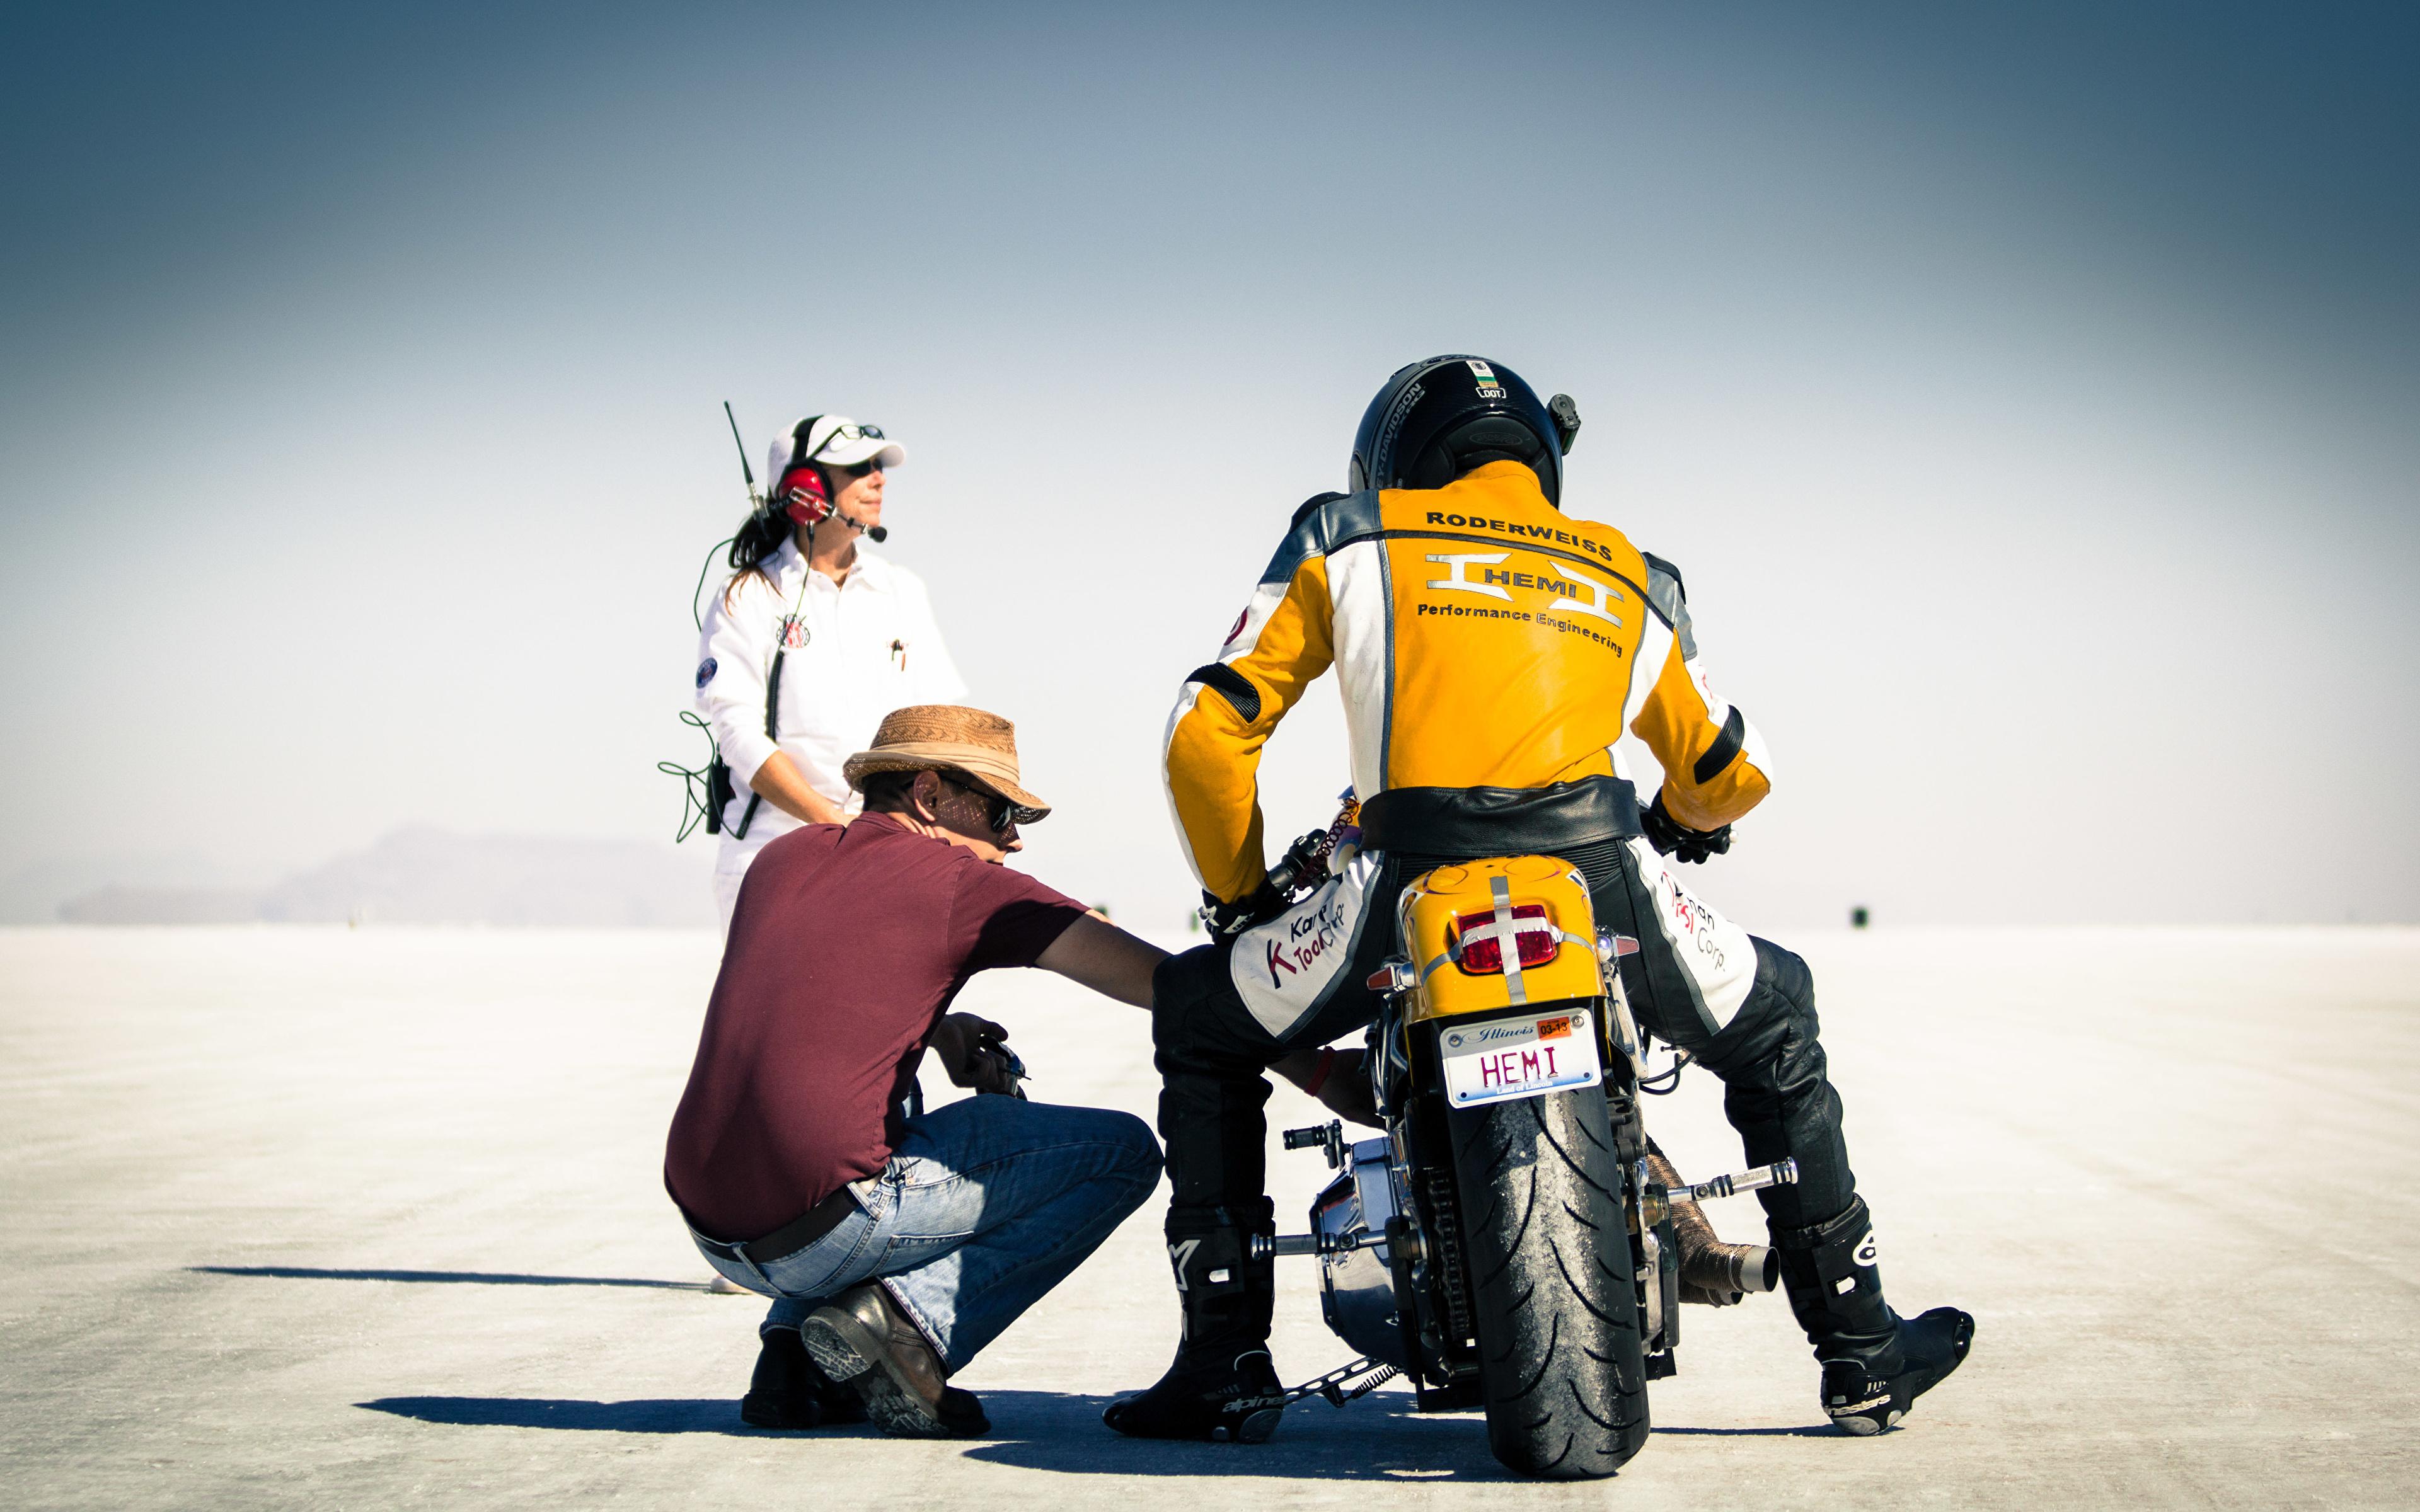 Images USA bonneville salt flats utah race mountain desert 3840x2400 3840x2400